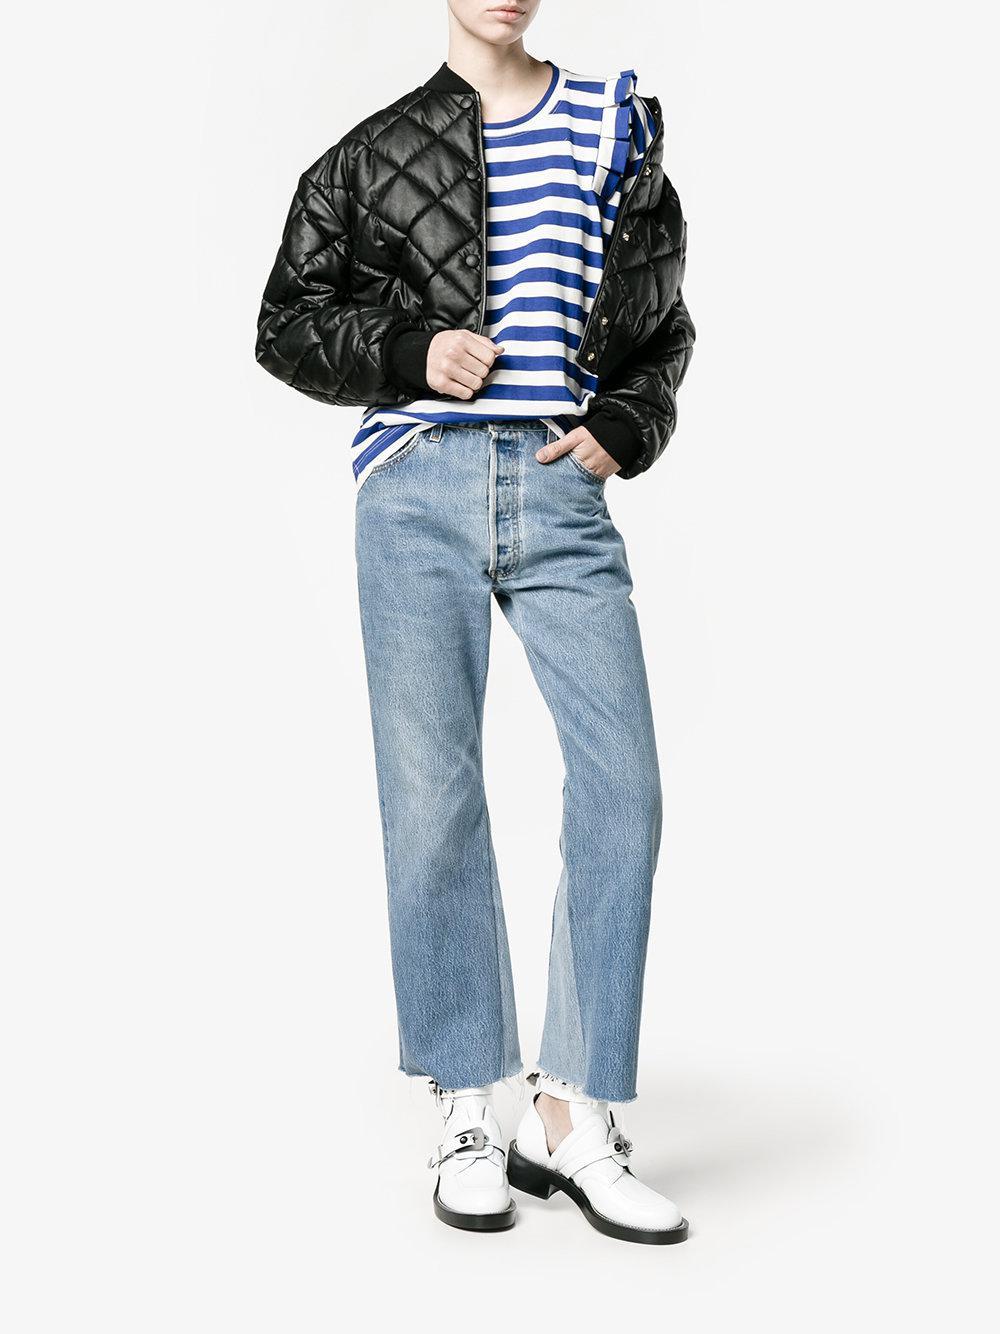 Balenciaga - 'apron' Boots - Women - Leather/metal - 36 in White